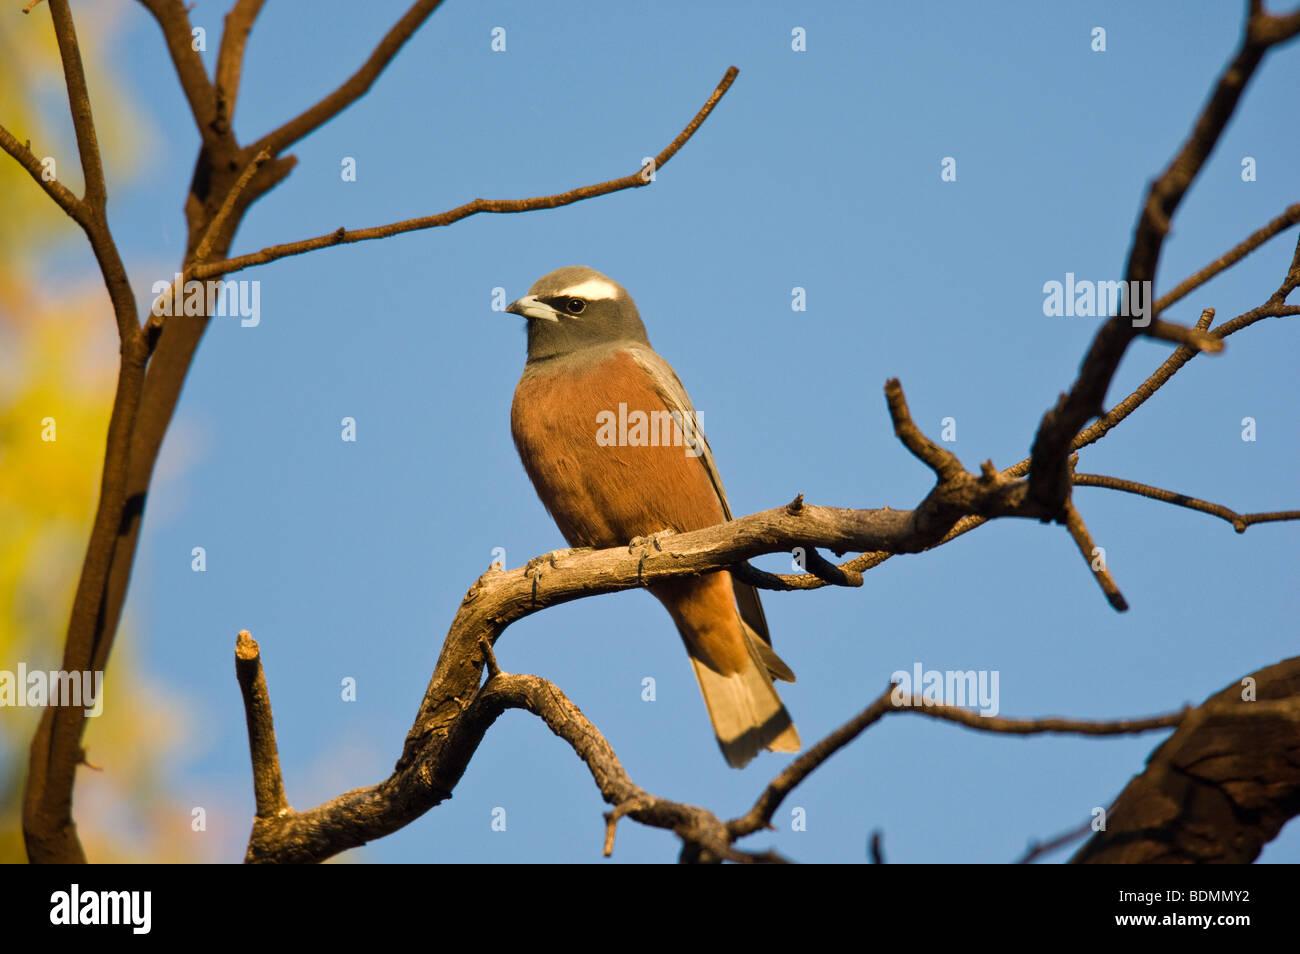 White-browed Woodswallow, Wanaaring, New South Wales, Australia - Stock Image